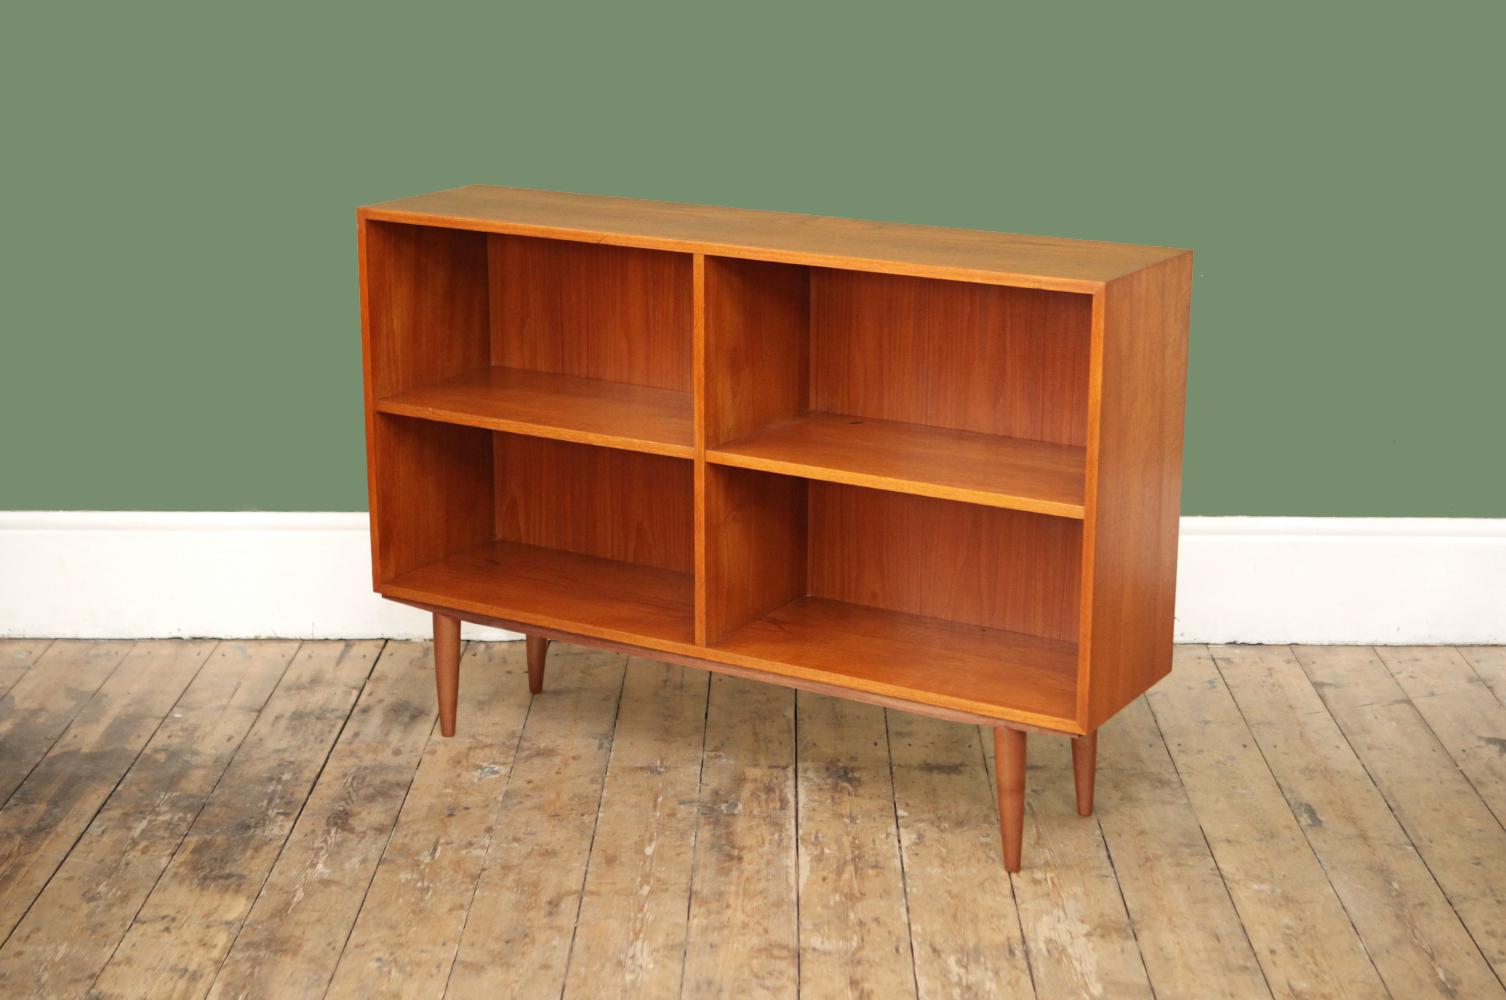 Horizontal Danish Mid Century Teak Bookcase